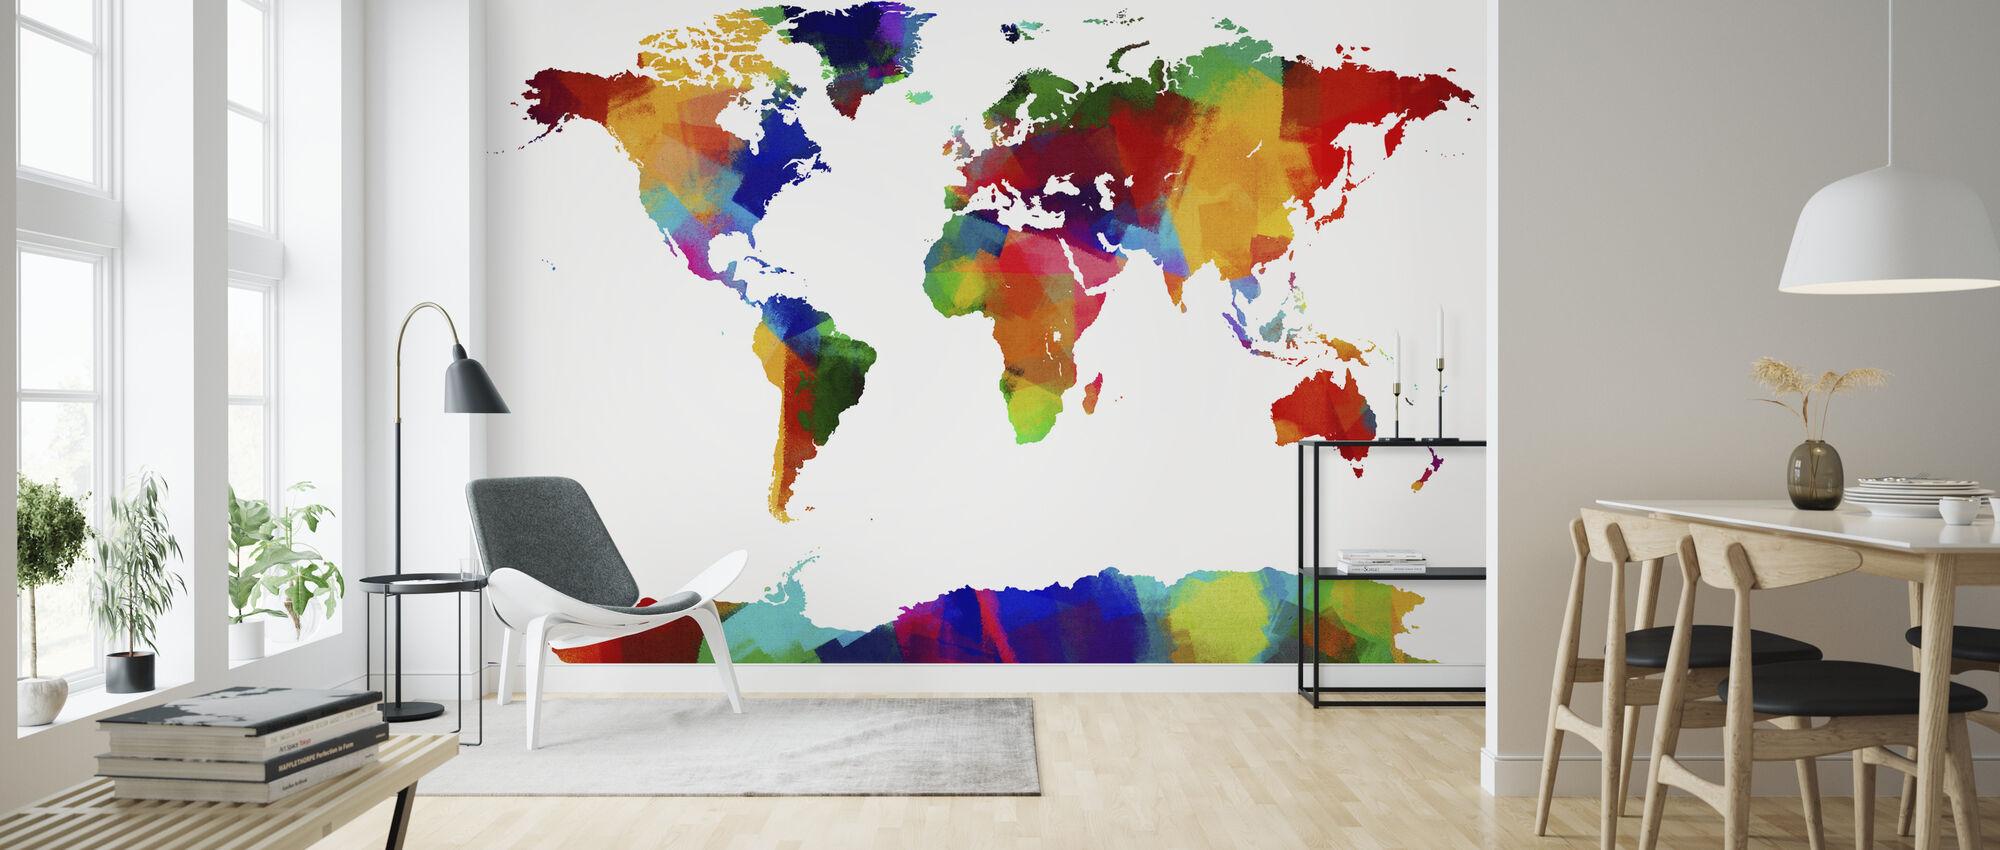 Sponge Paint World Map - Tapet - Stue